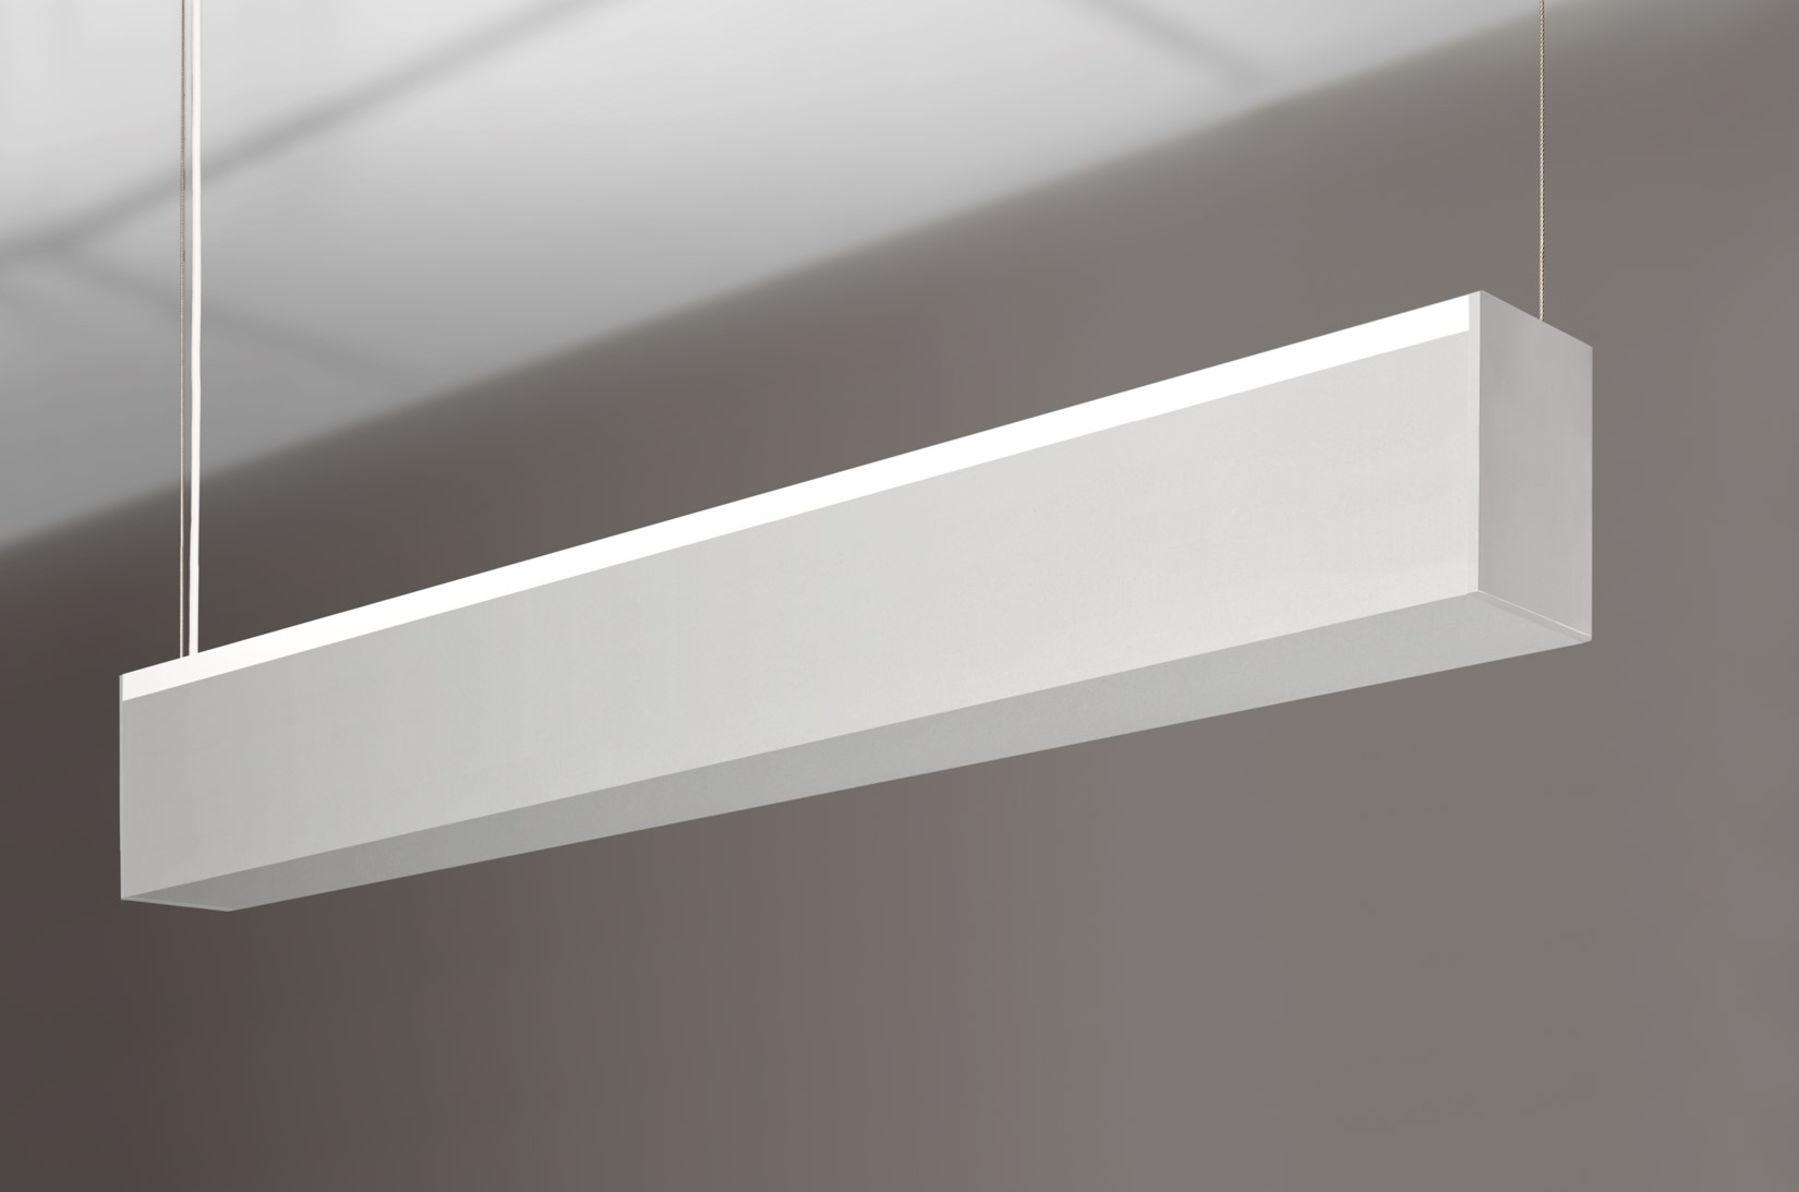 Picture of GX3D34U2-LED-LENS3D